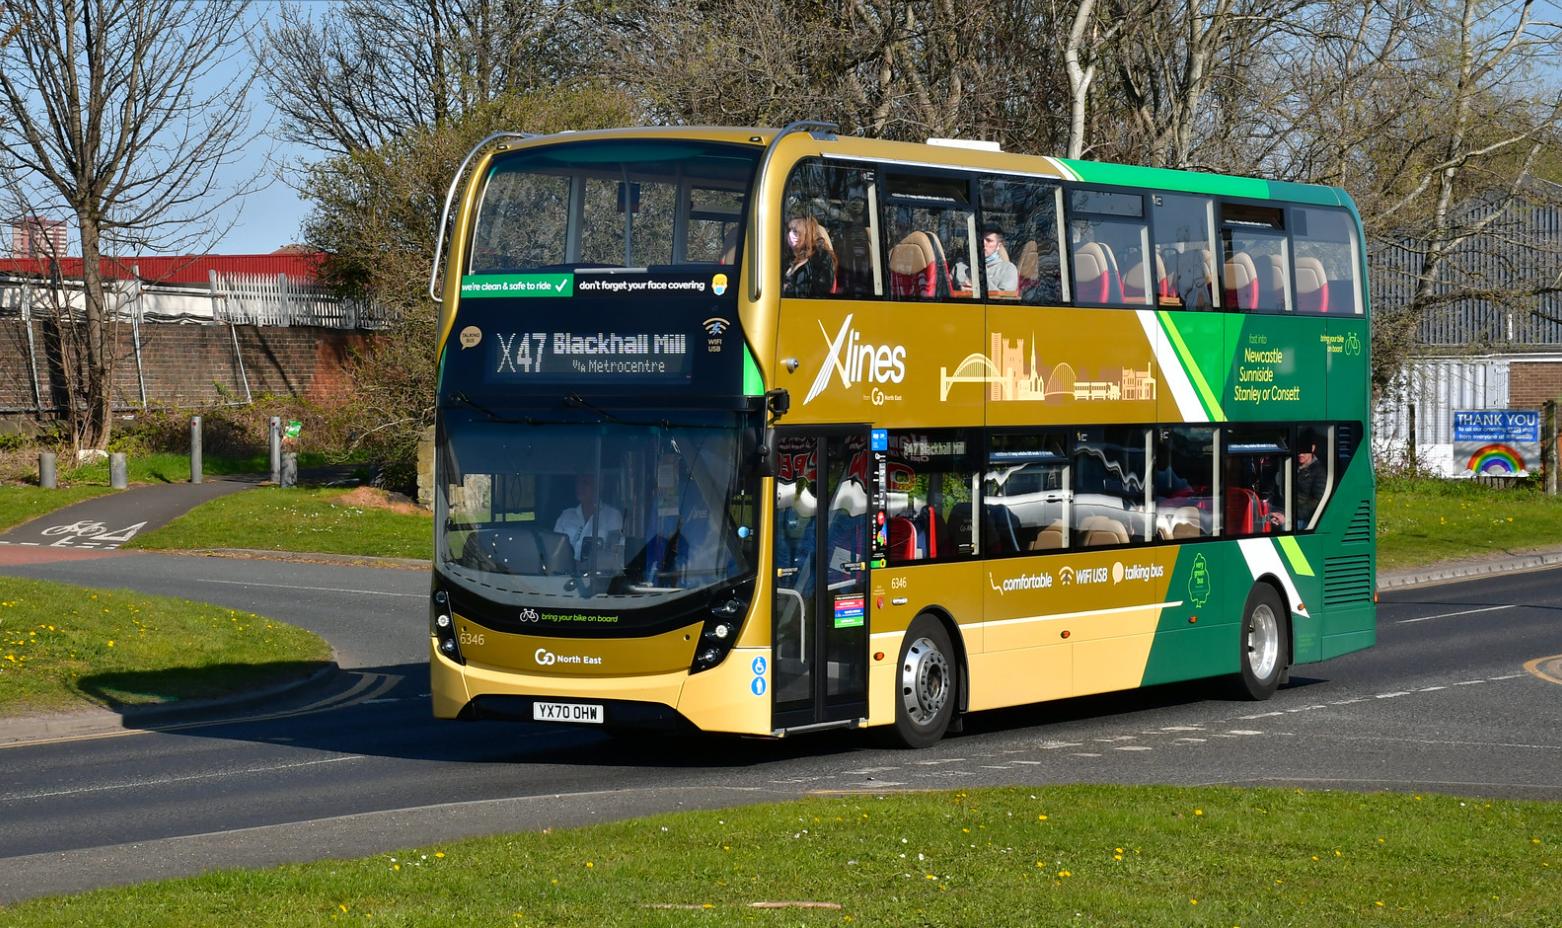 X-lines X47 bus